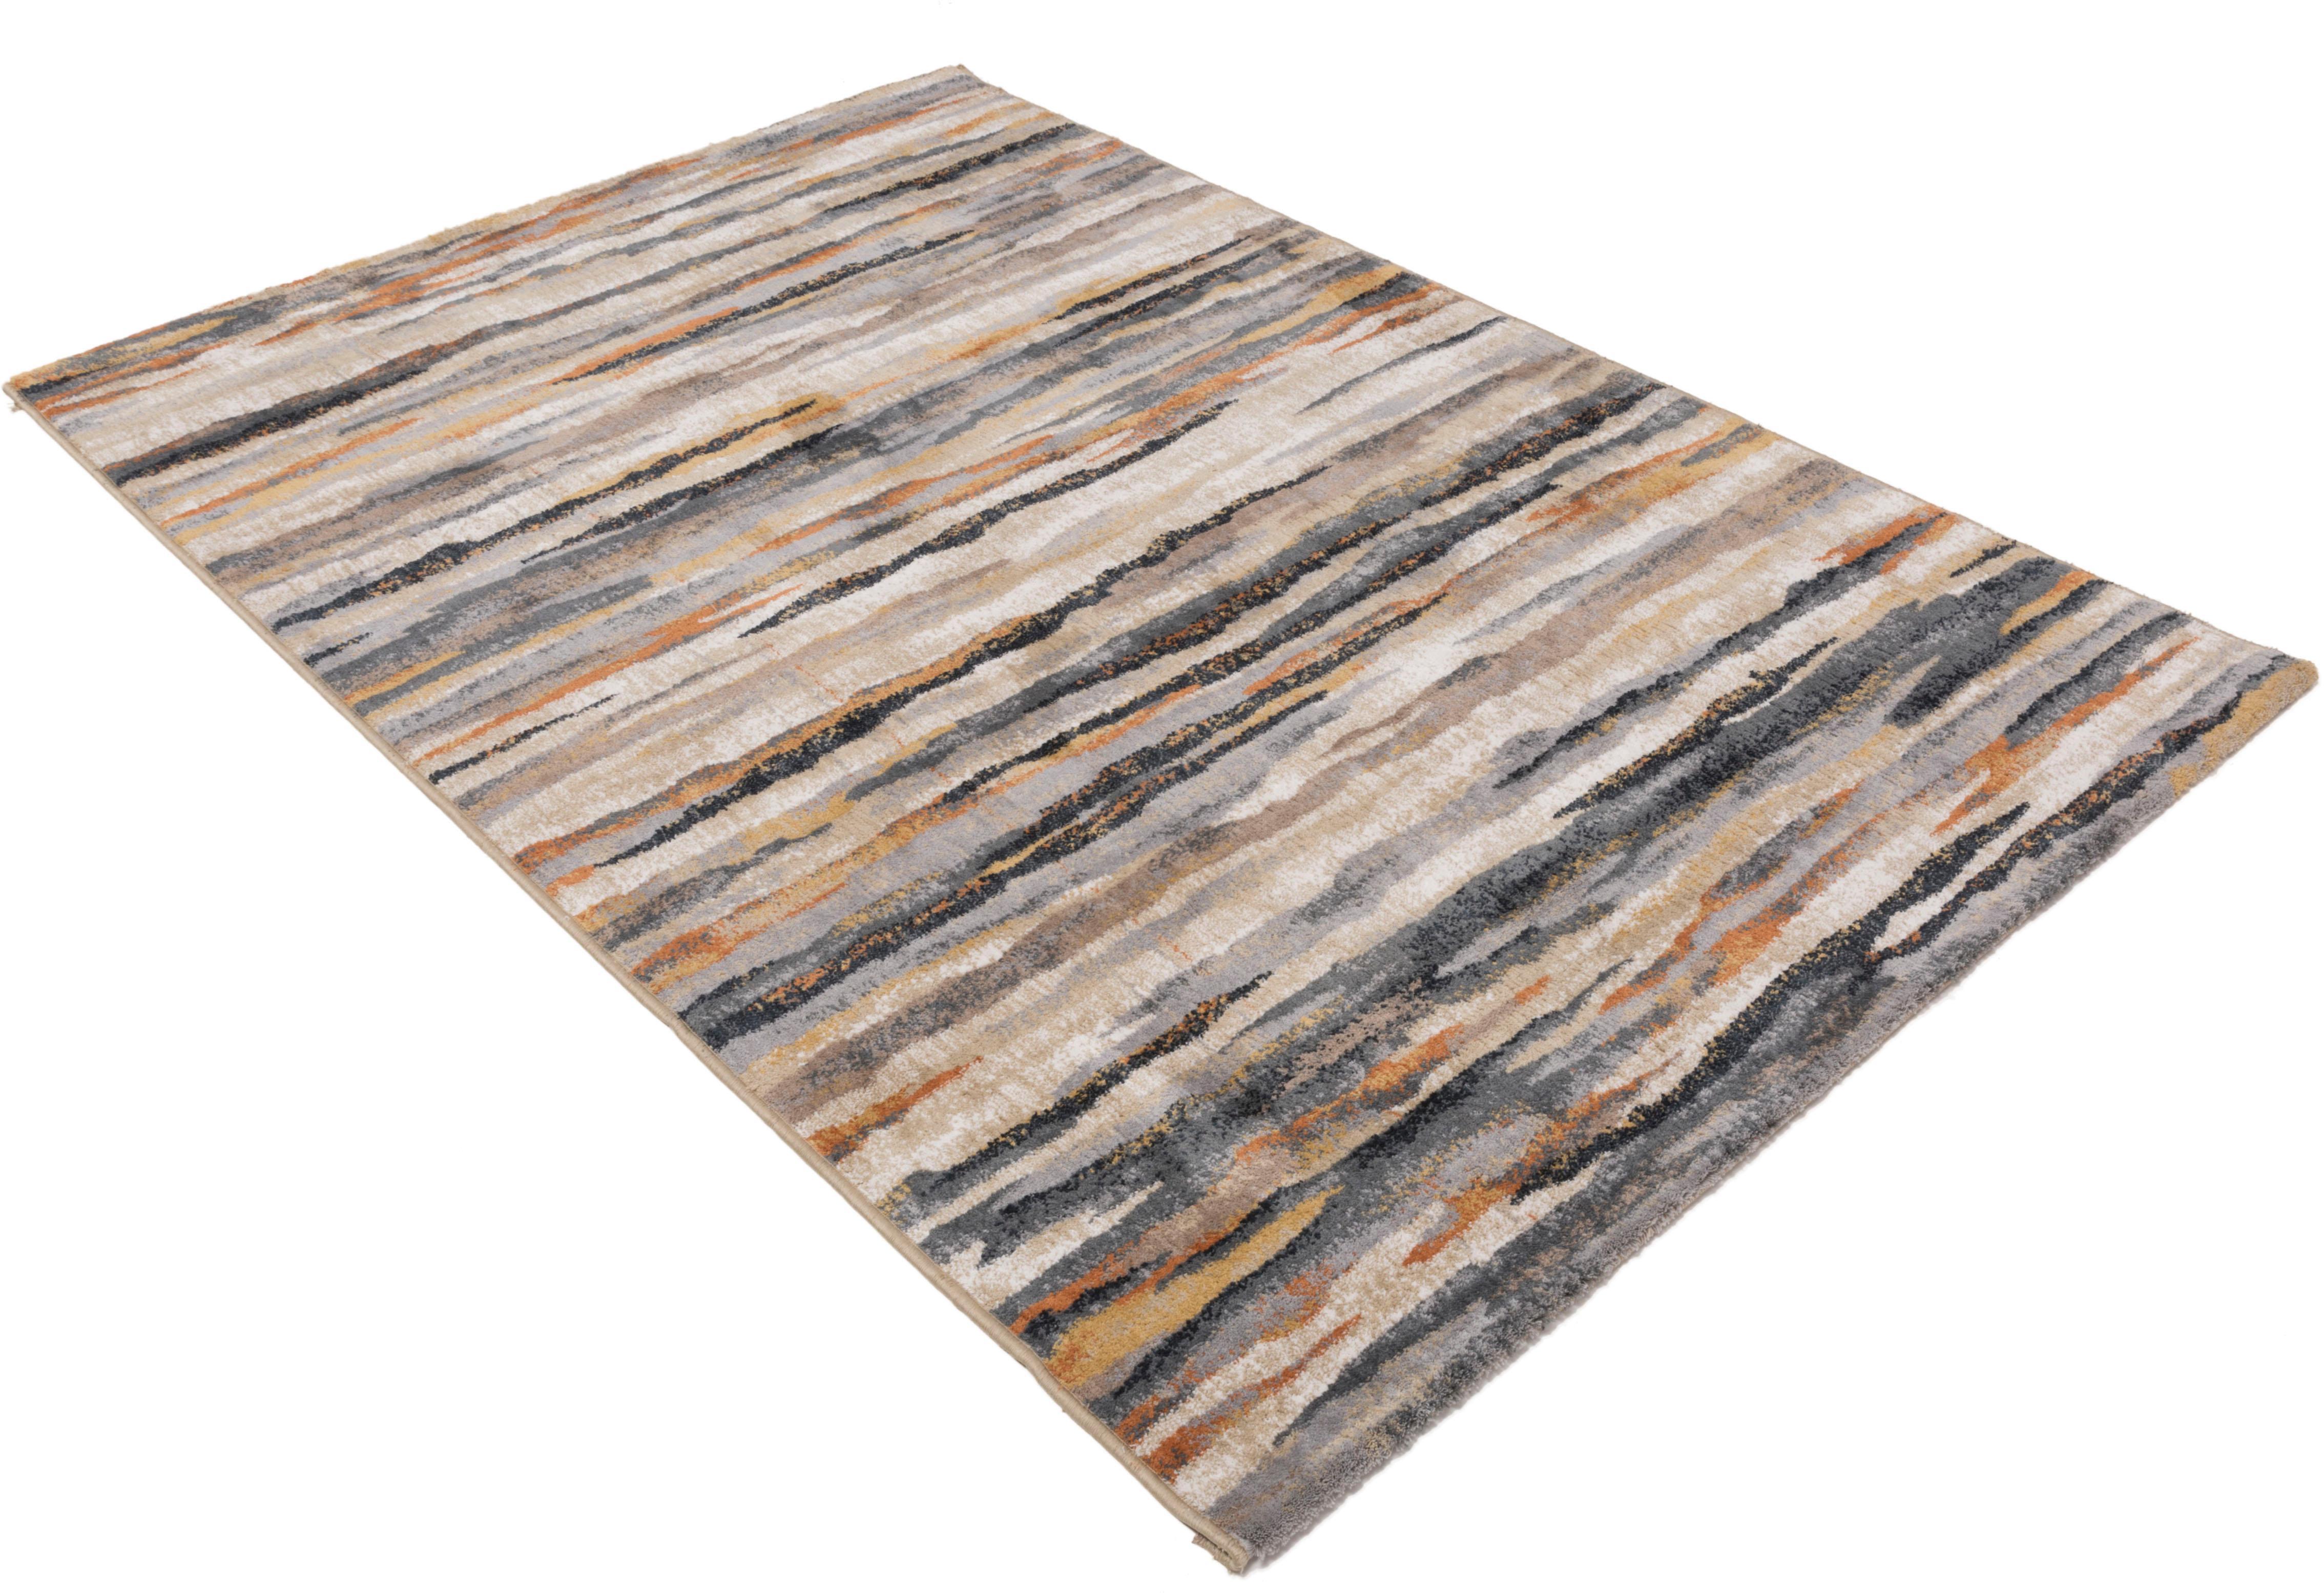 Teppich Anna Maria Stirpe Gino Falcone rechteckig Höhe 20 mm maschinell gewebt